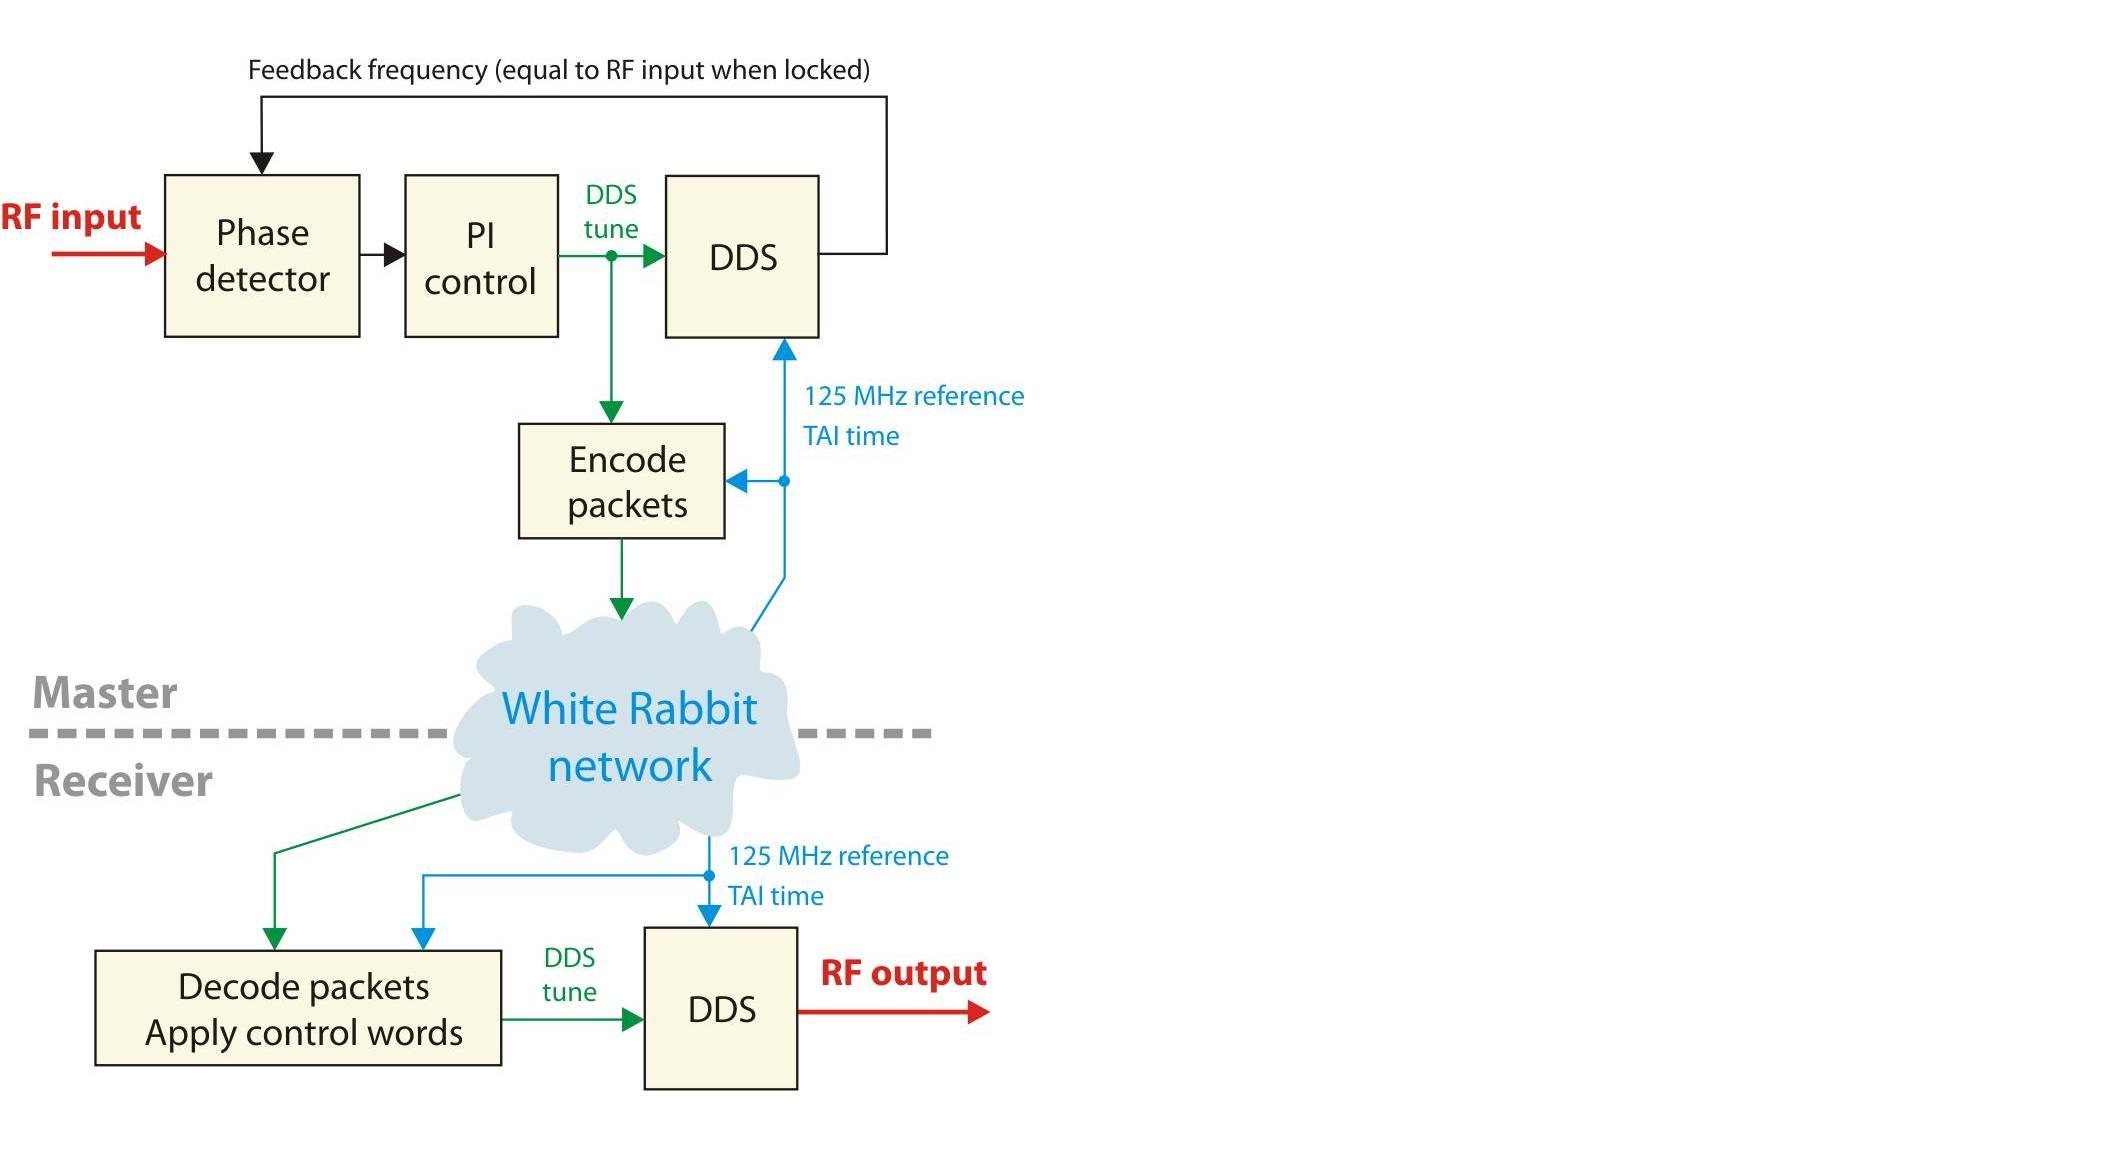 figures/applications/DDS-0.jpg